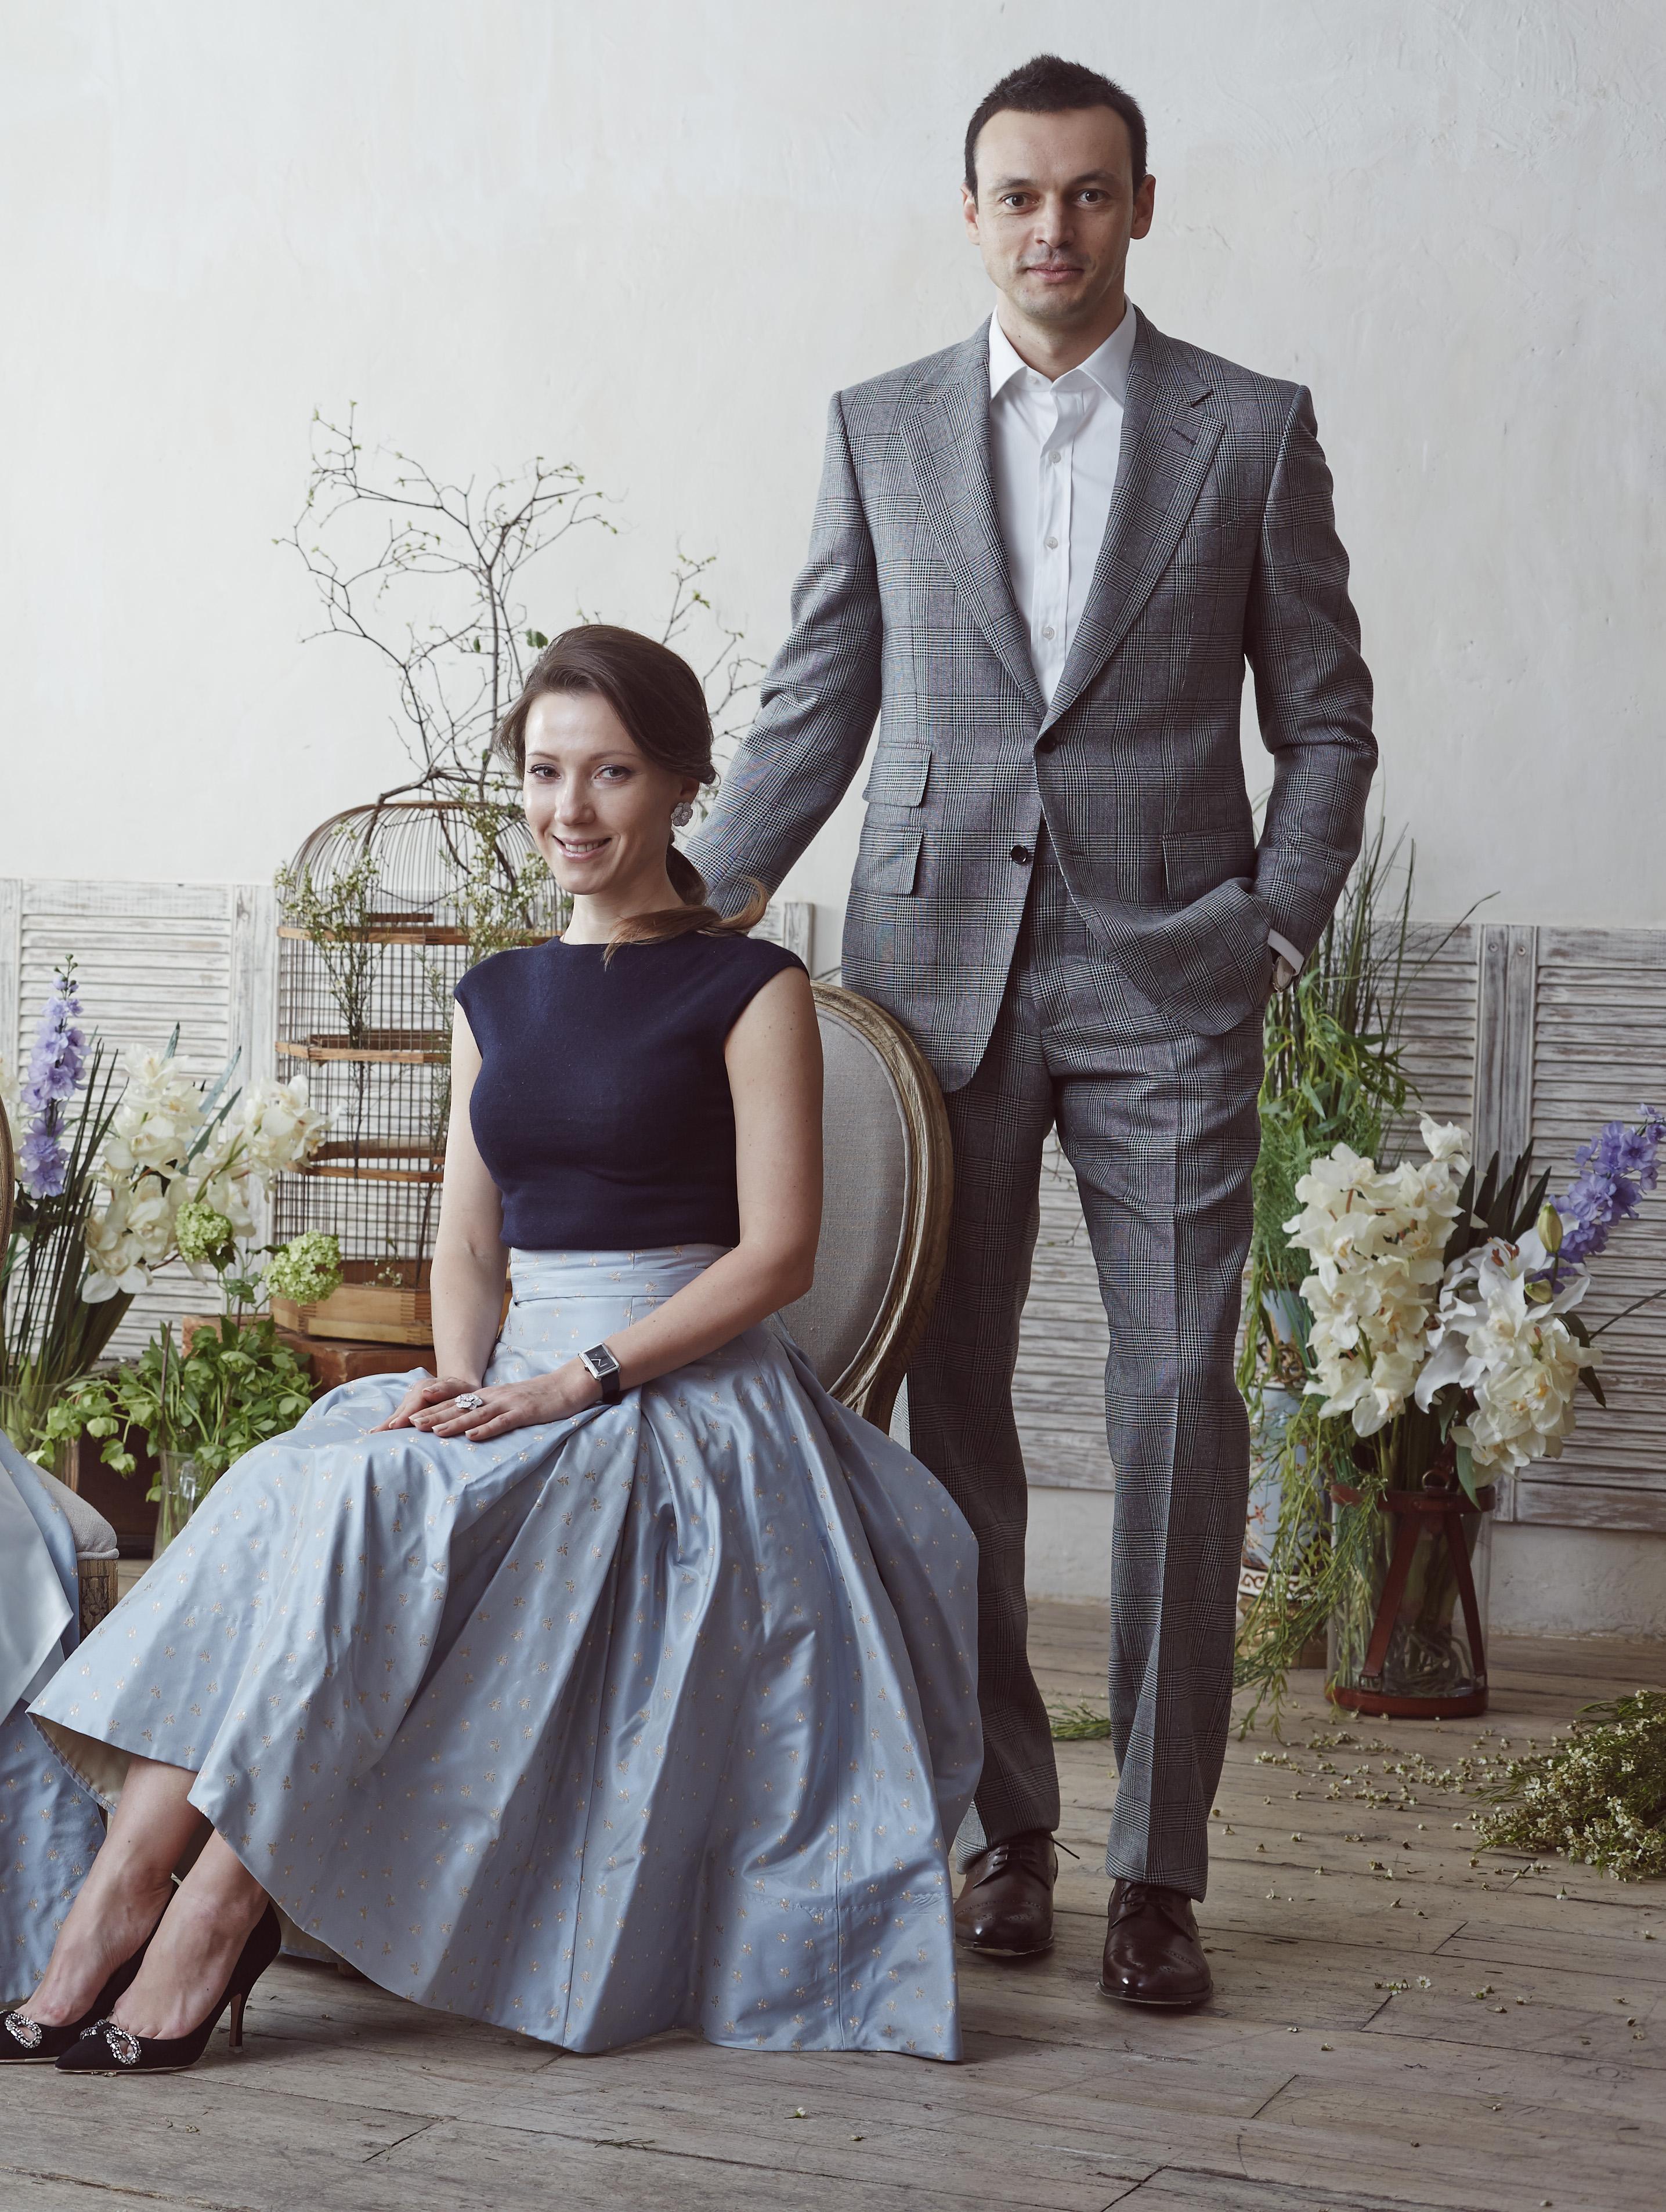 Evgeny Demin and Elena Demina / Source: Press photo